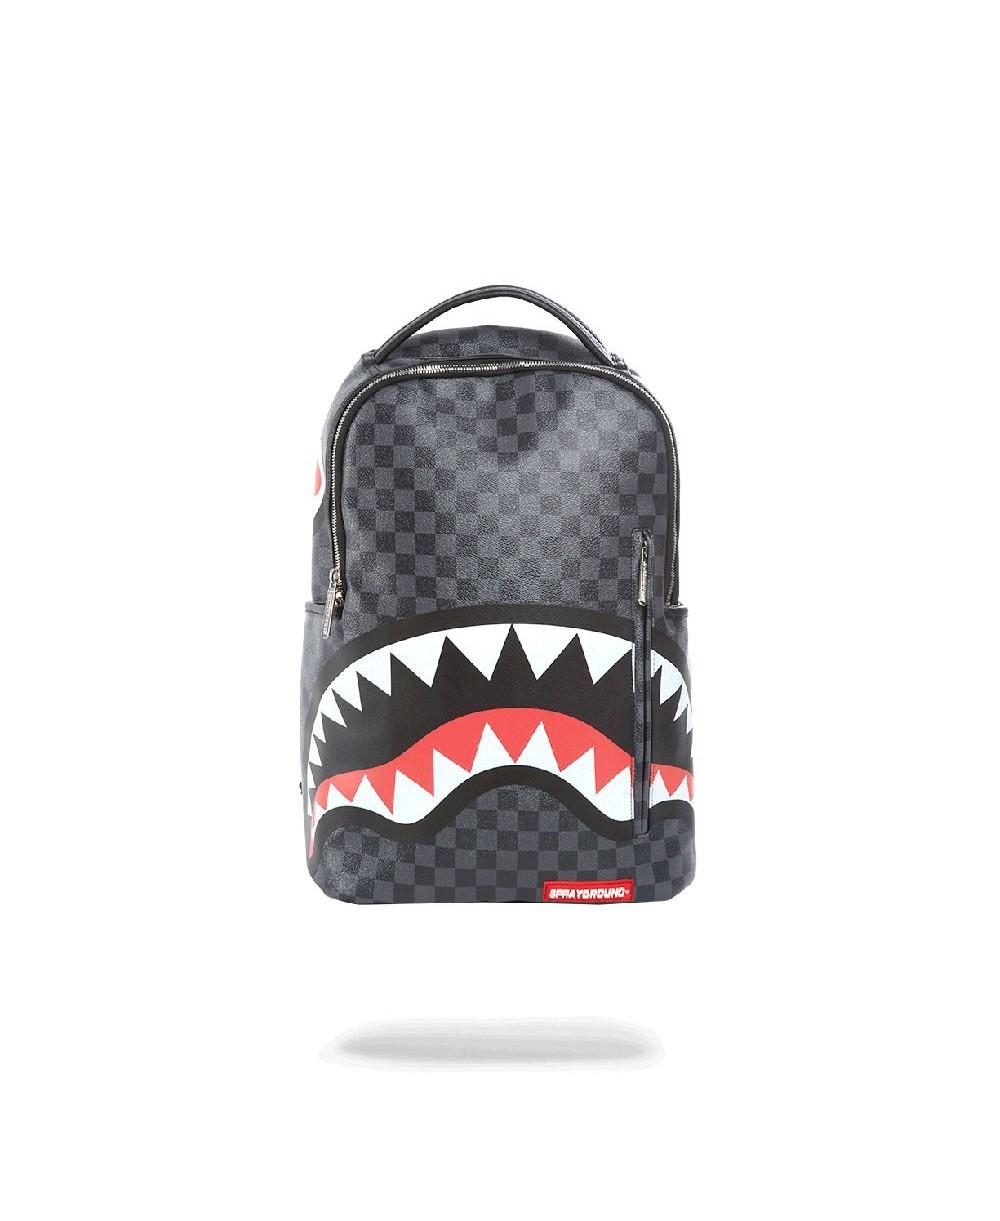 bd27c02c3 Sprayground Sharks in Paris Backpack Black